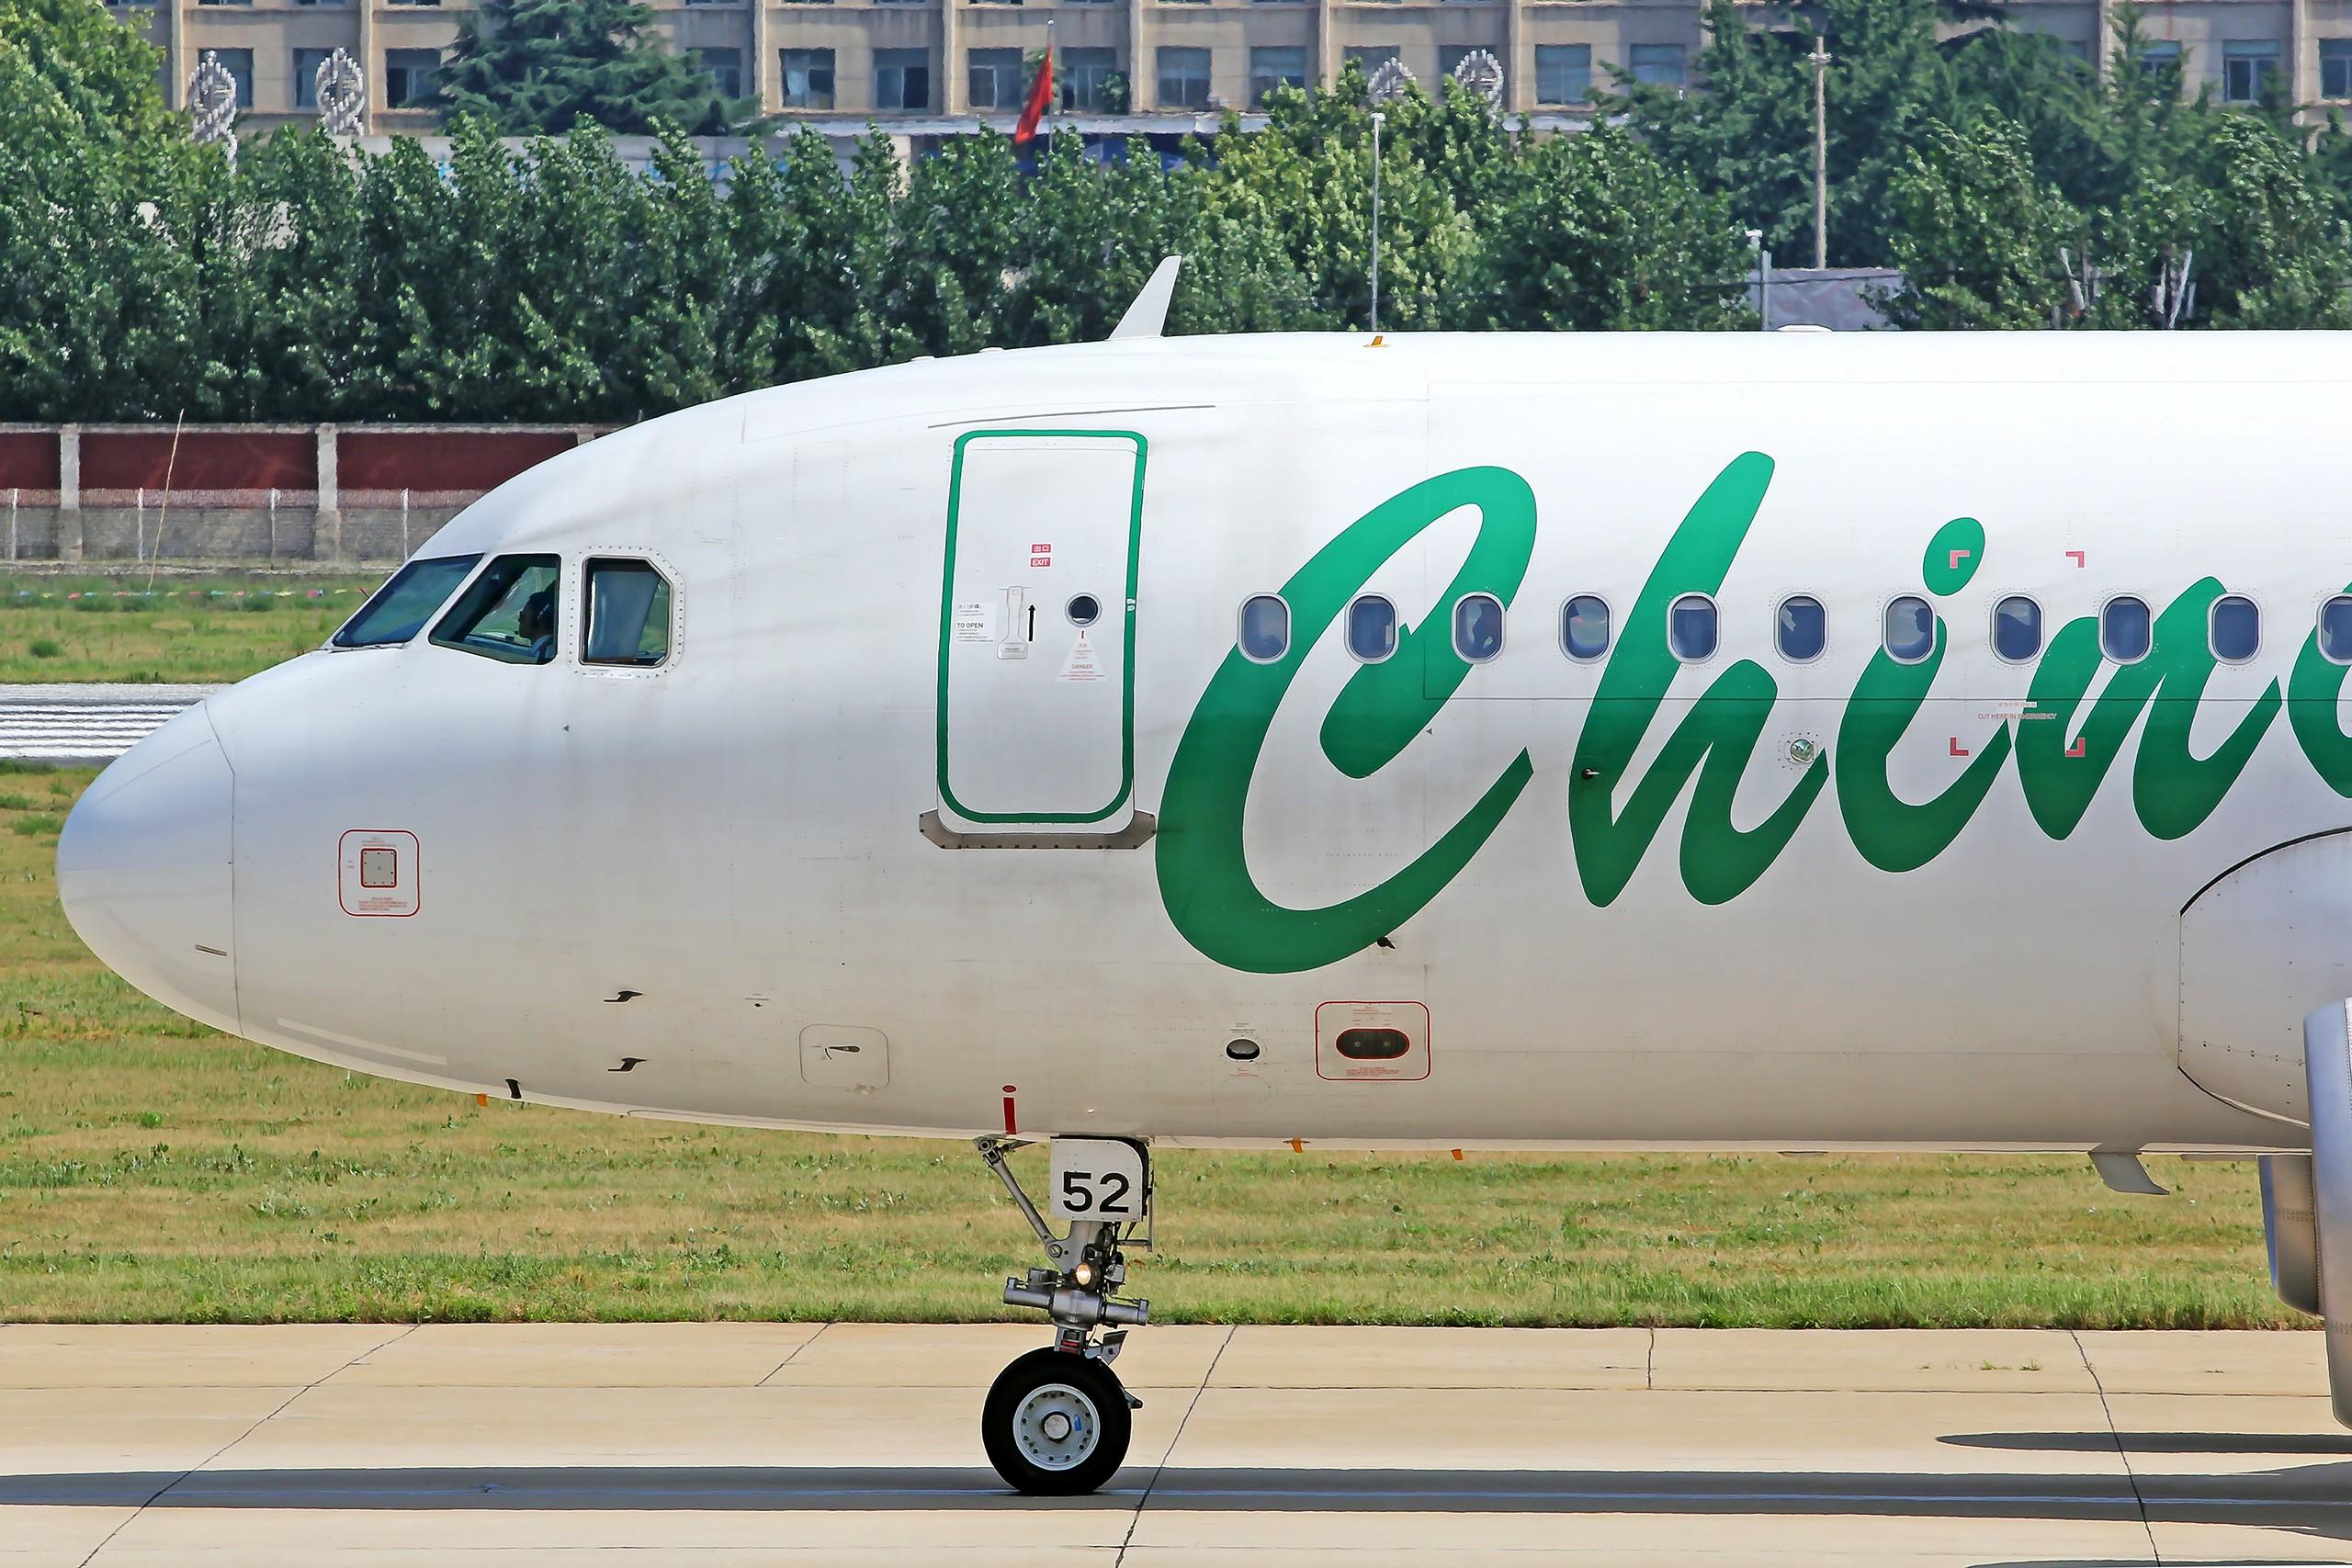 Re:[原创][DLC]。。。无标题。。。{2560x1707}Pix AIRBUS A320-200 B-6852 中国大连周水子国际机场